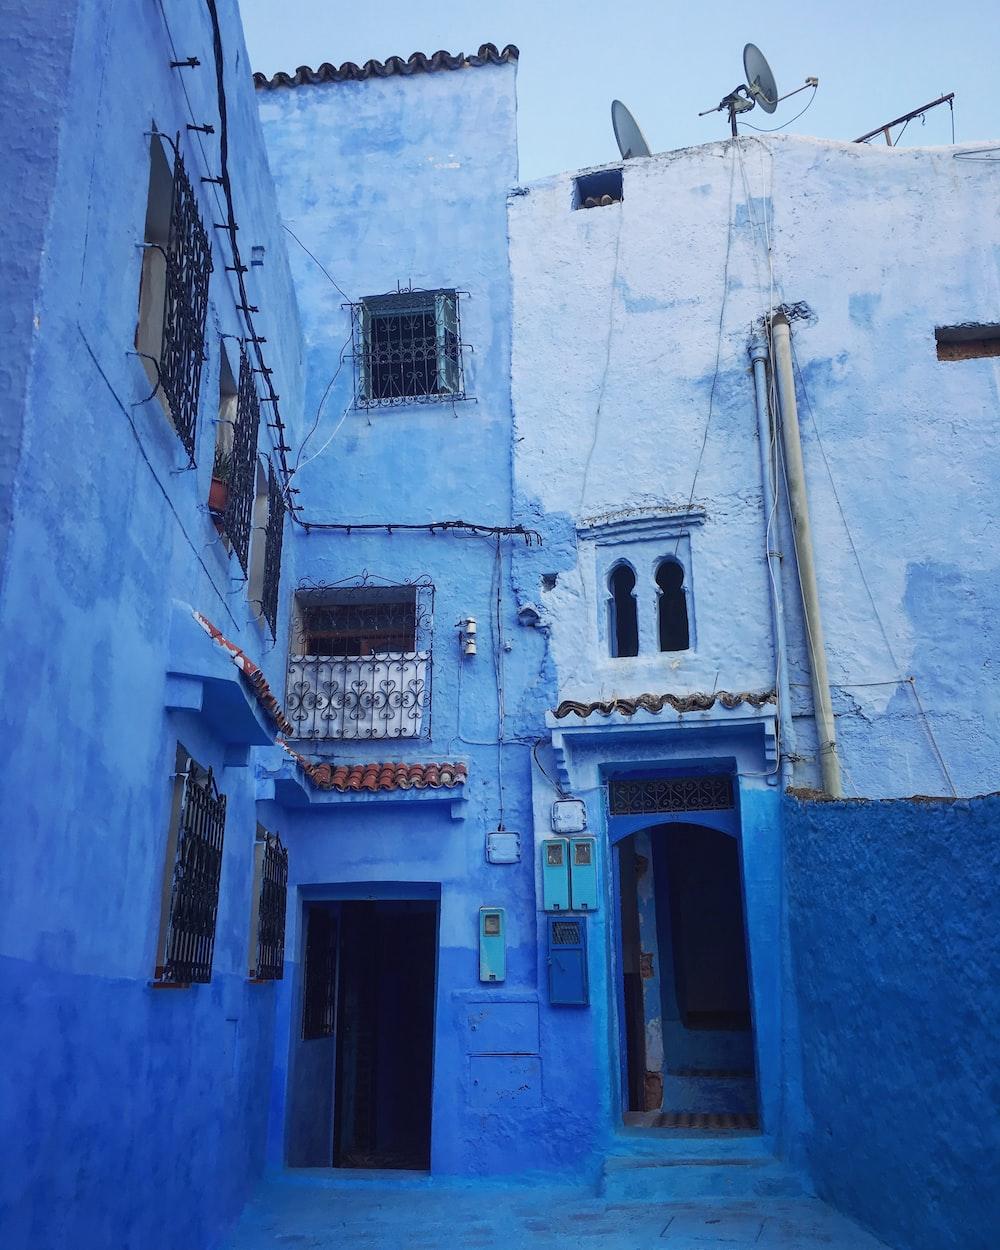 blue and gray concrete 3-storey building